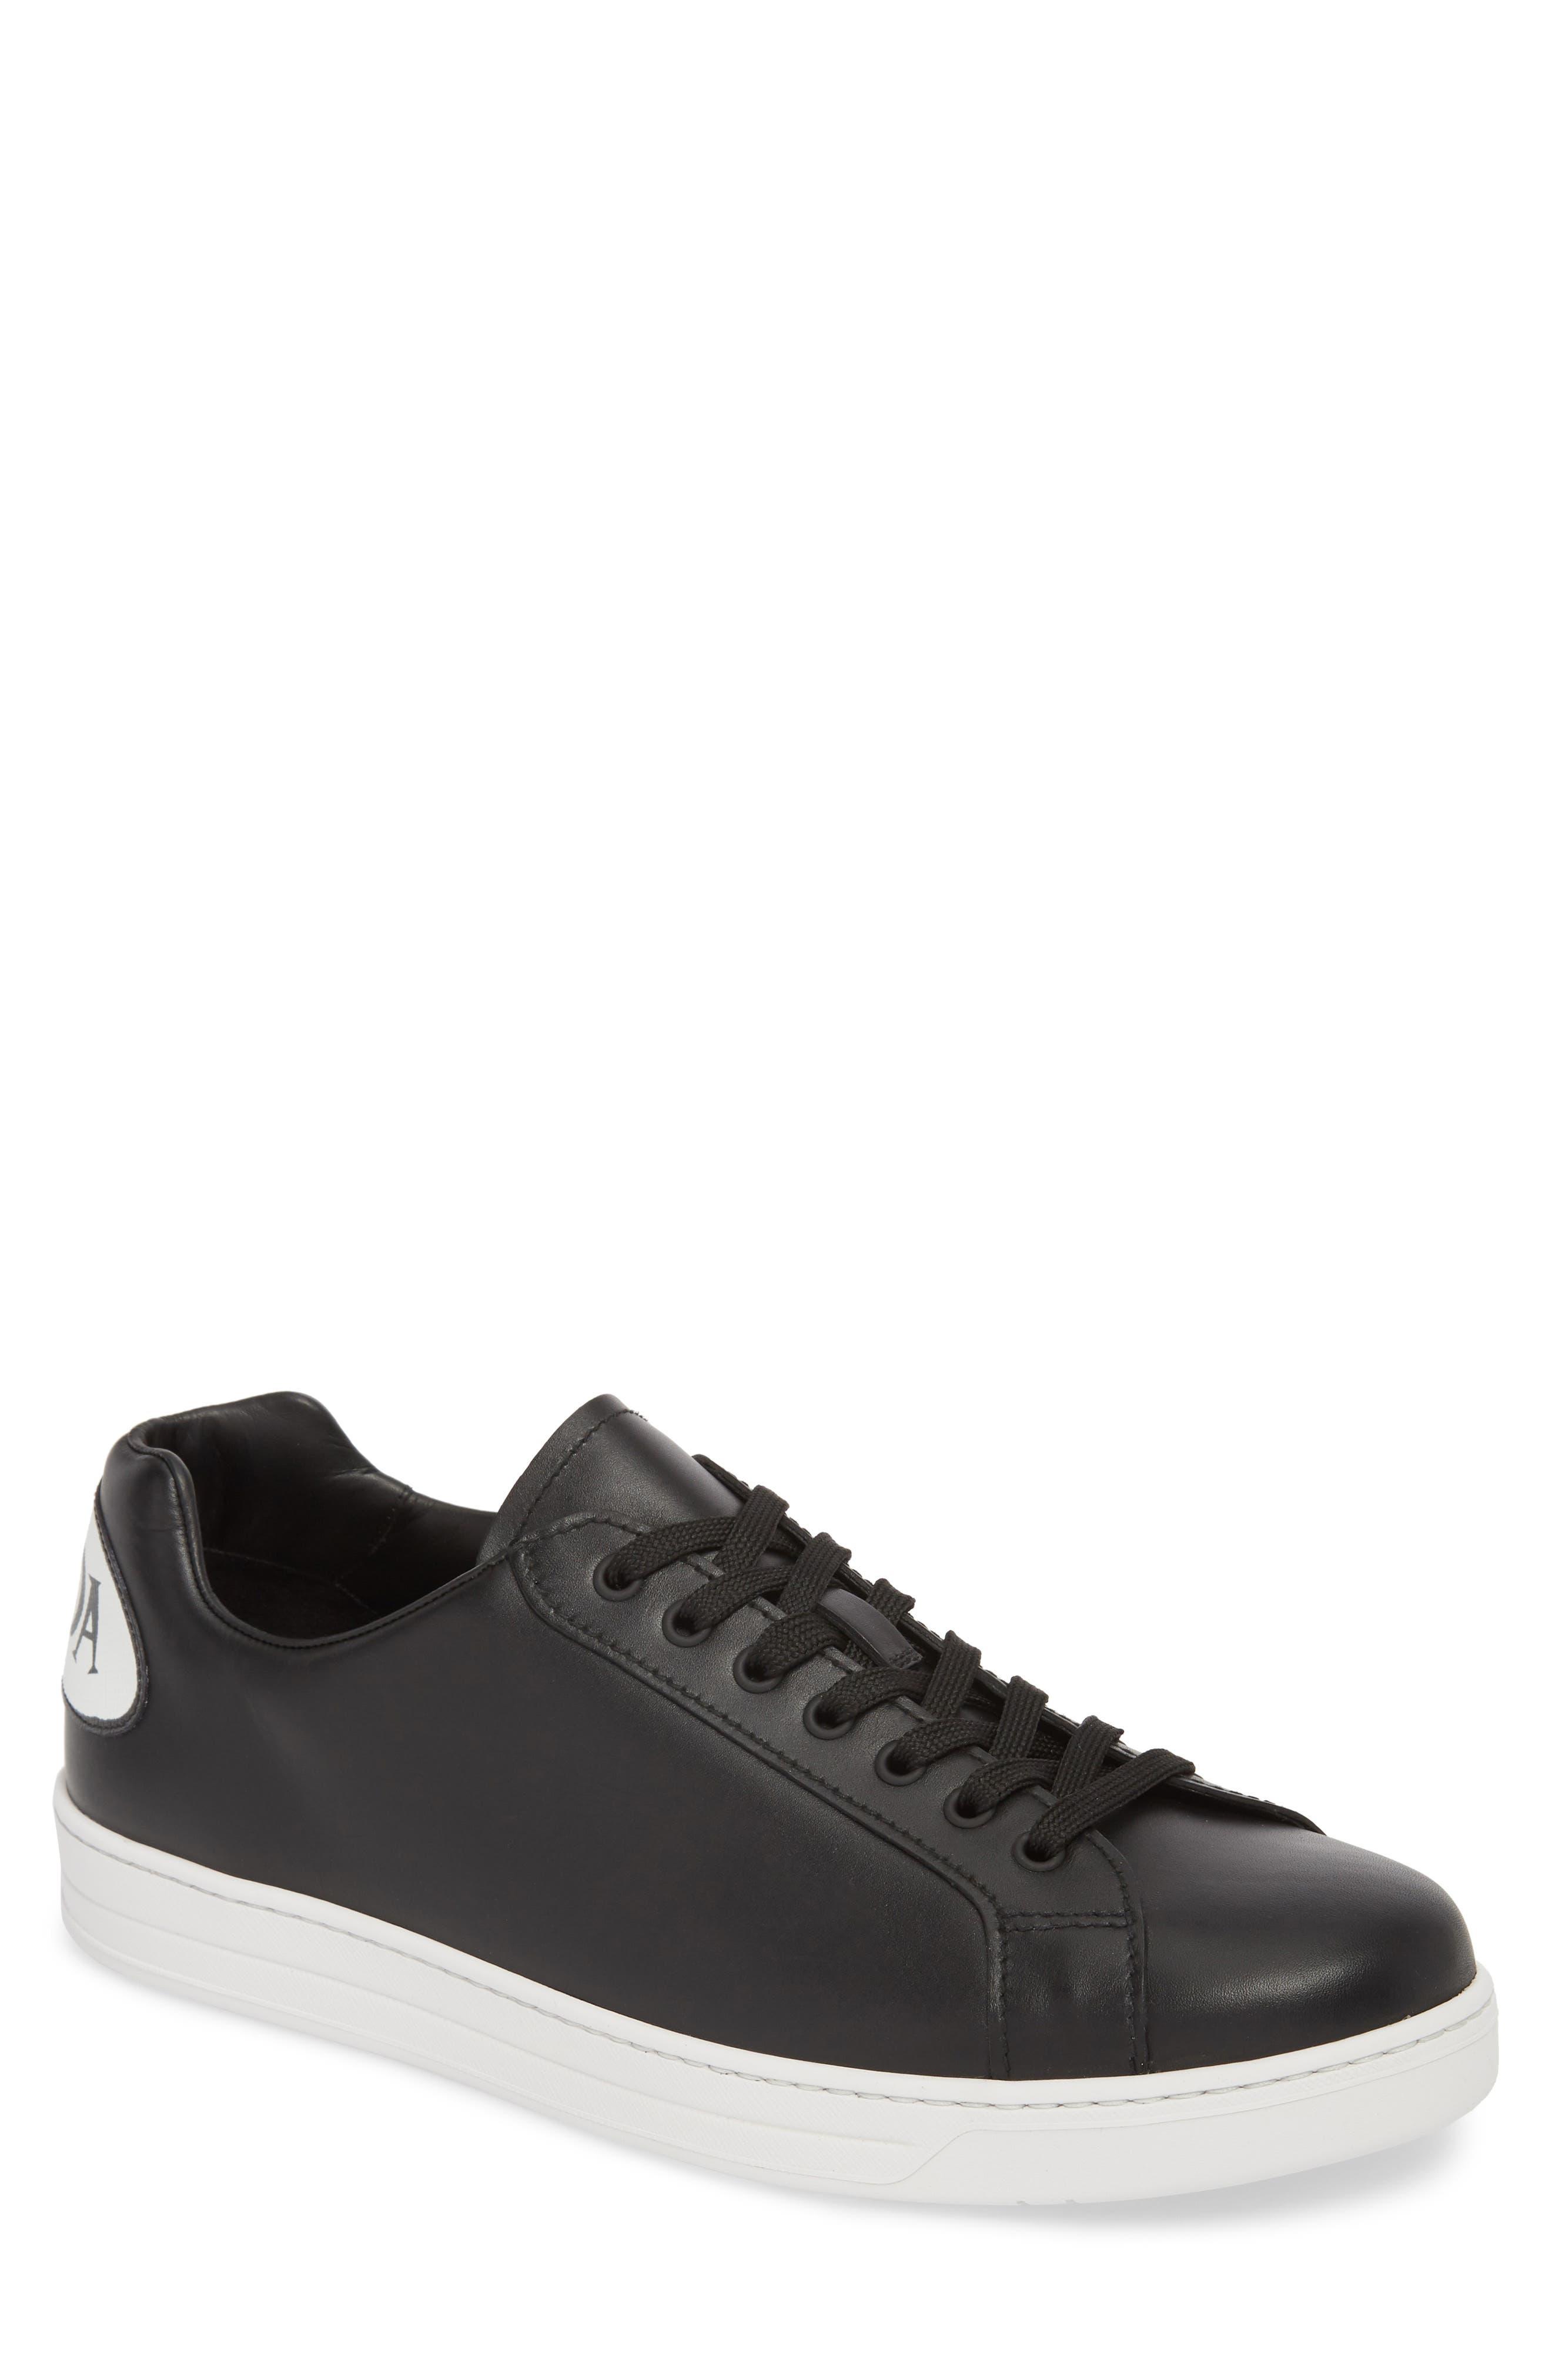 PRADA LINEA ROSSA Patch Low Top Sneaker, Main, color, 012